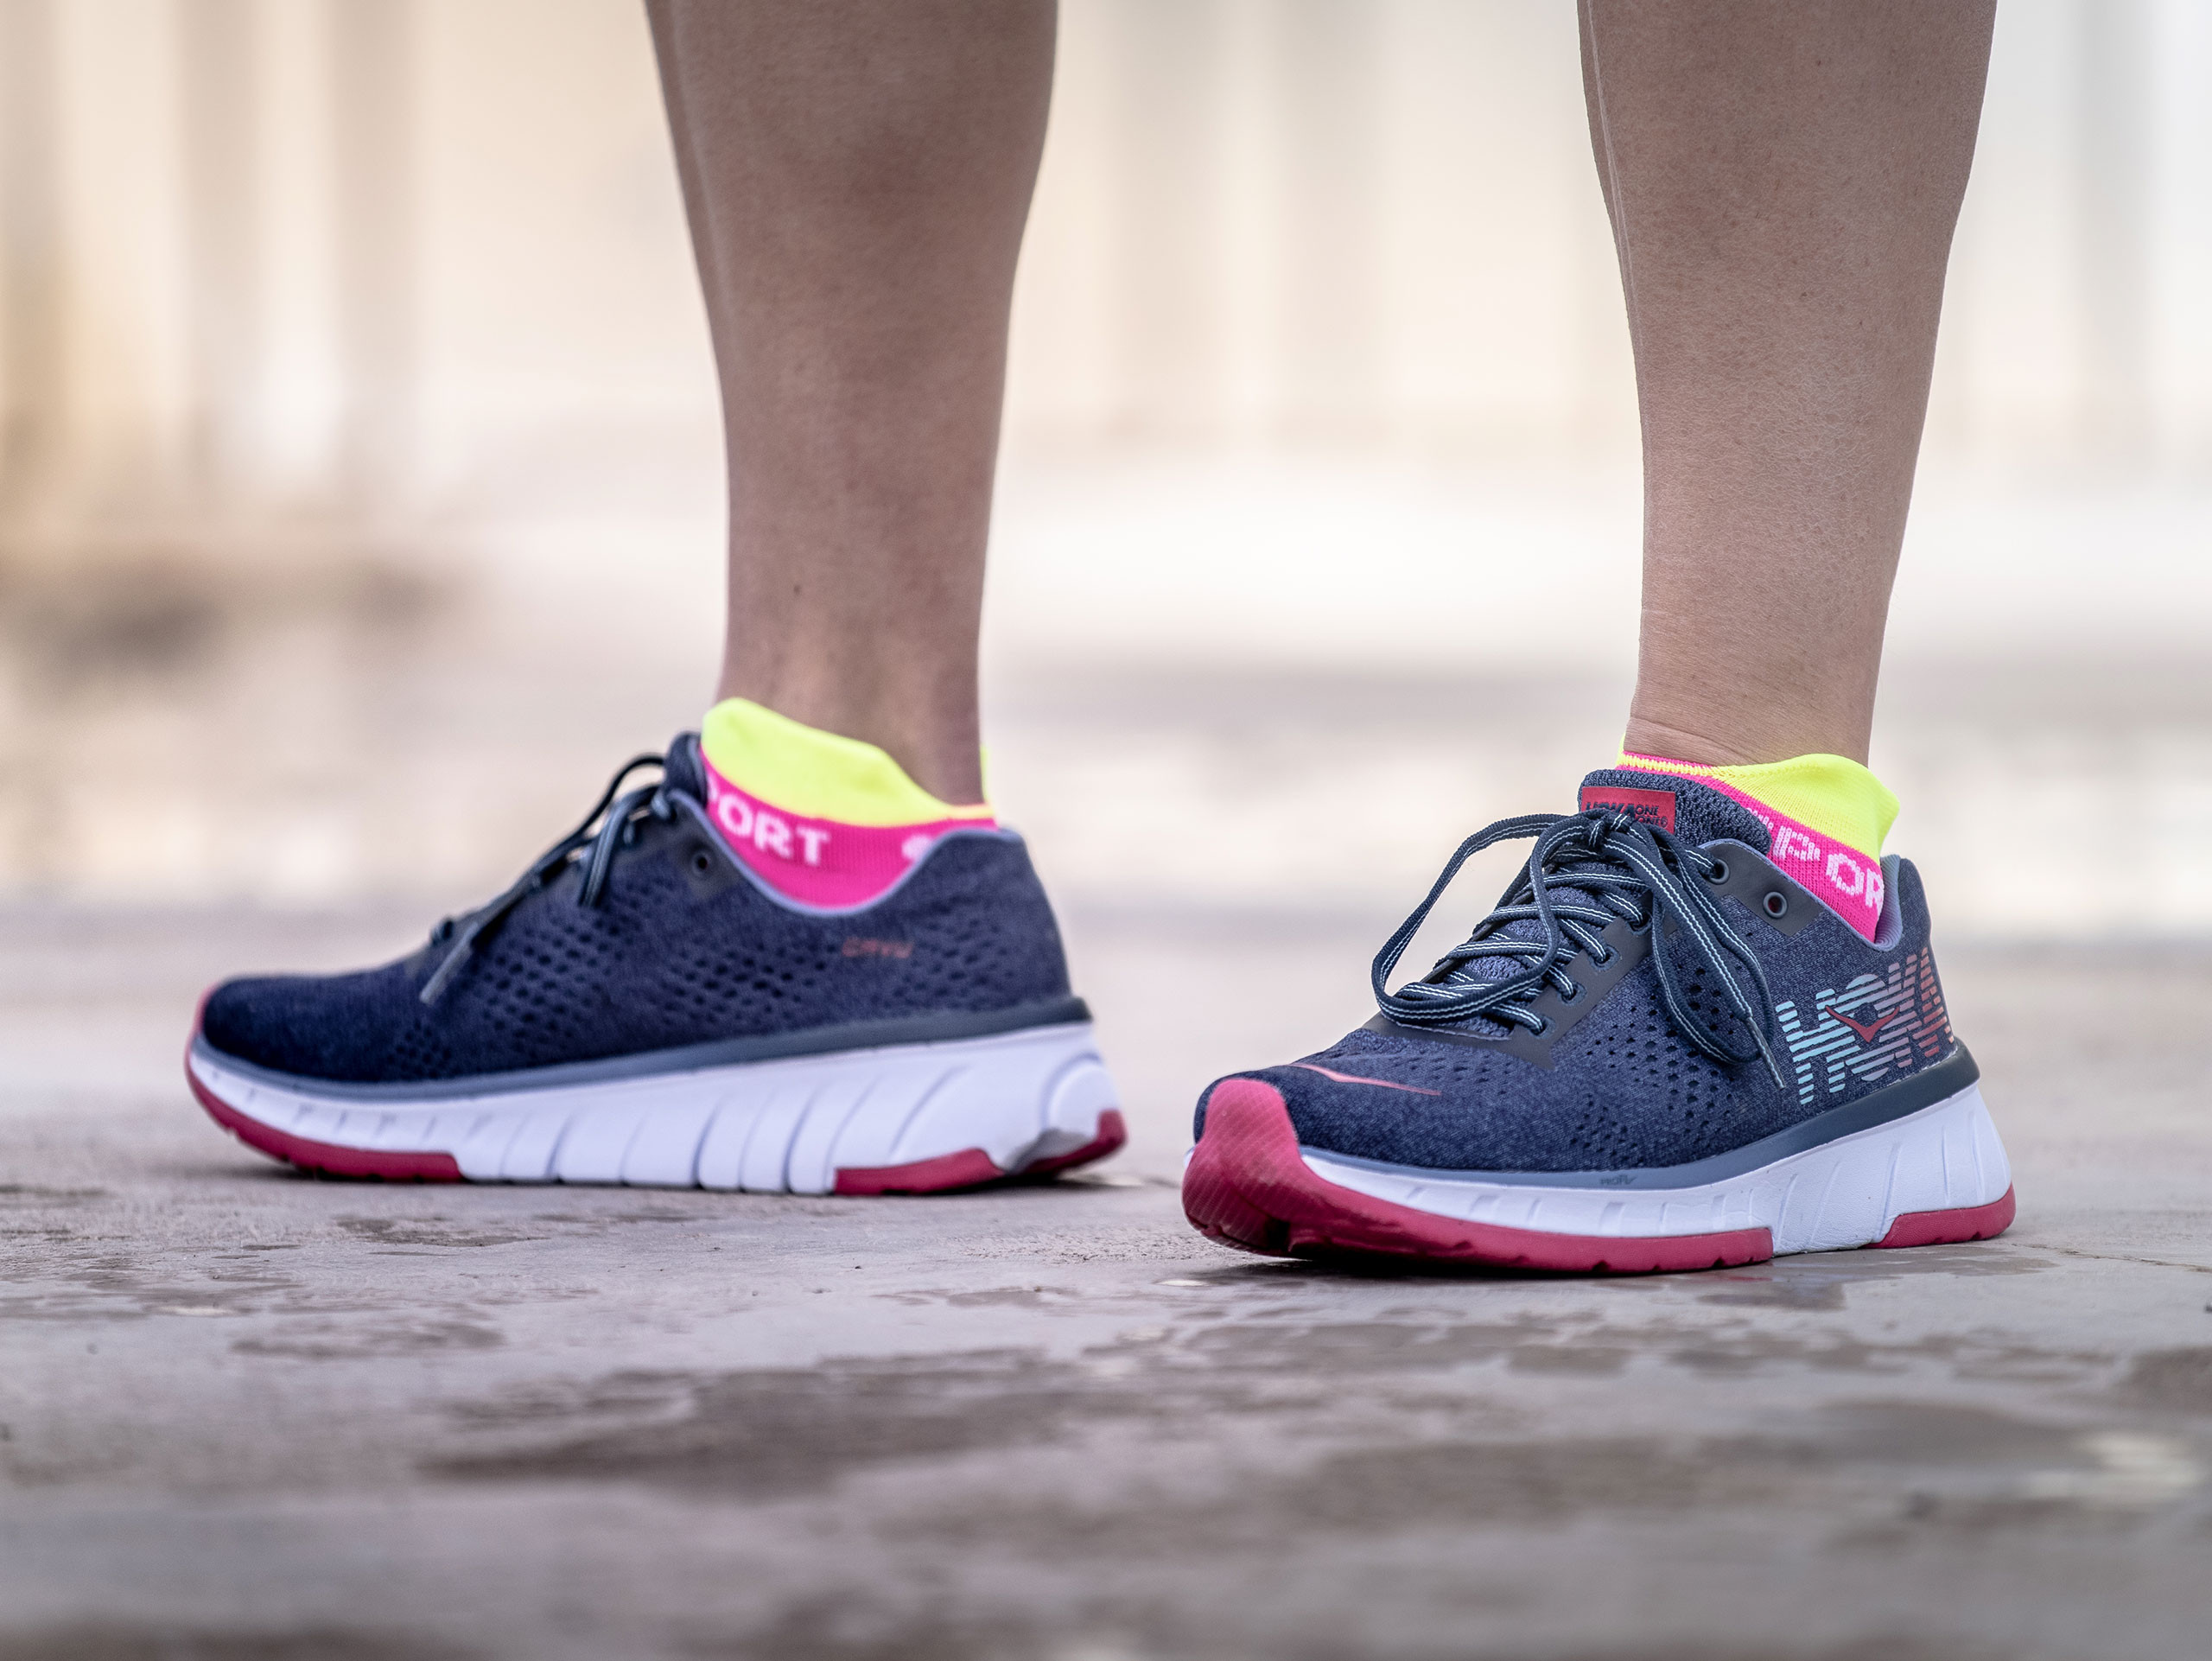 Pro Racing Socks v3.0 Run Ultralight Run Low fluo pink